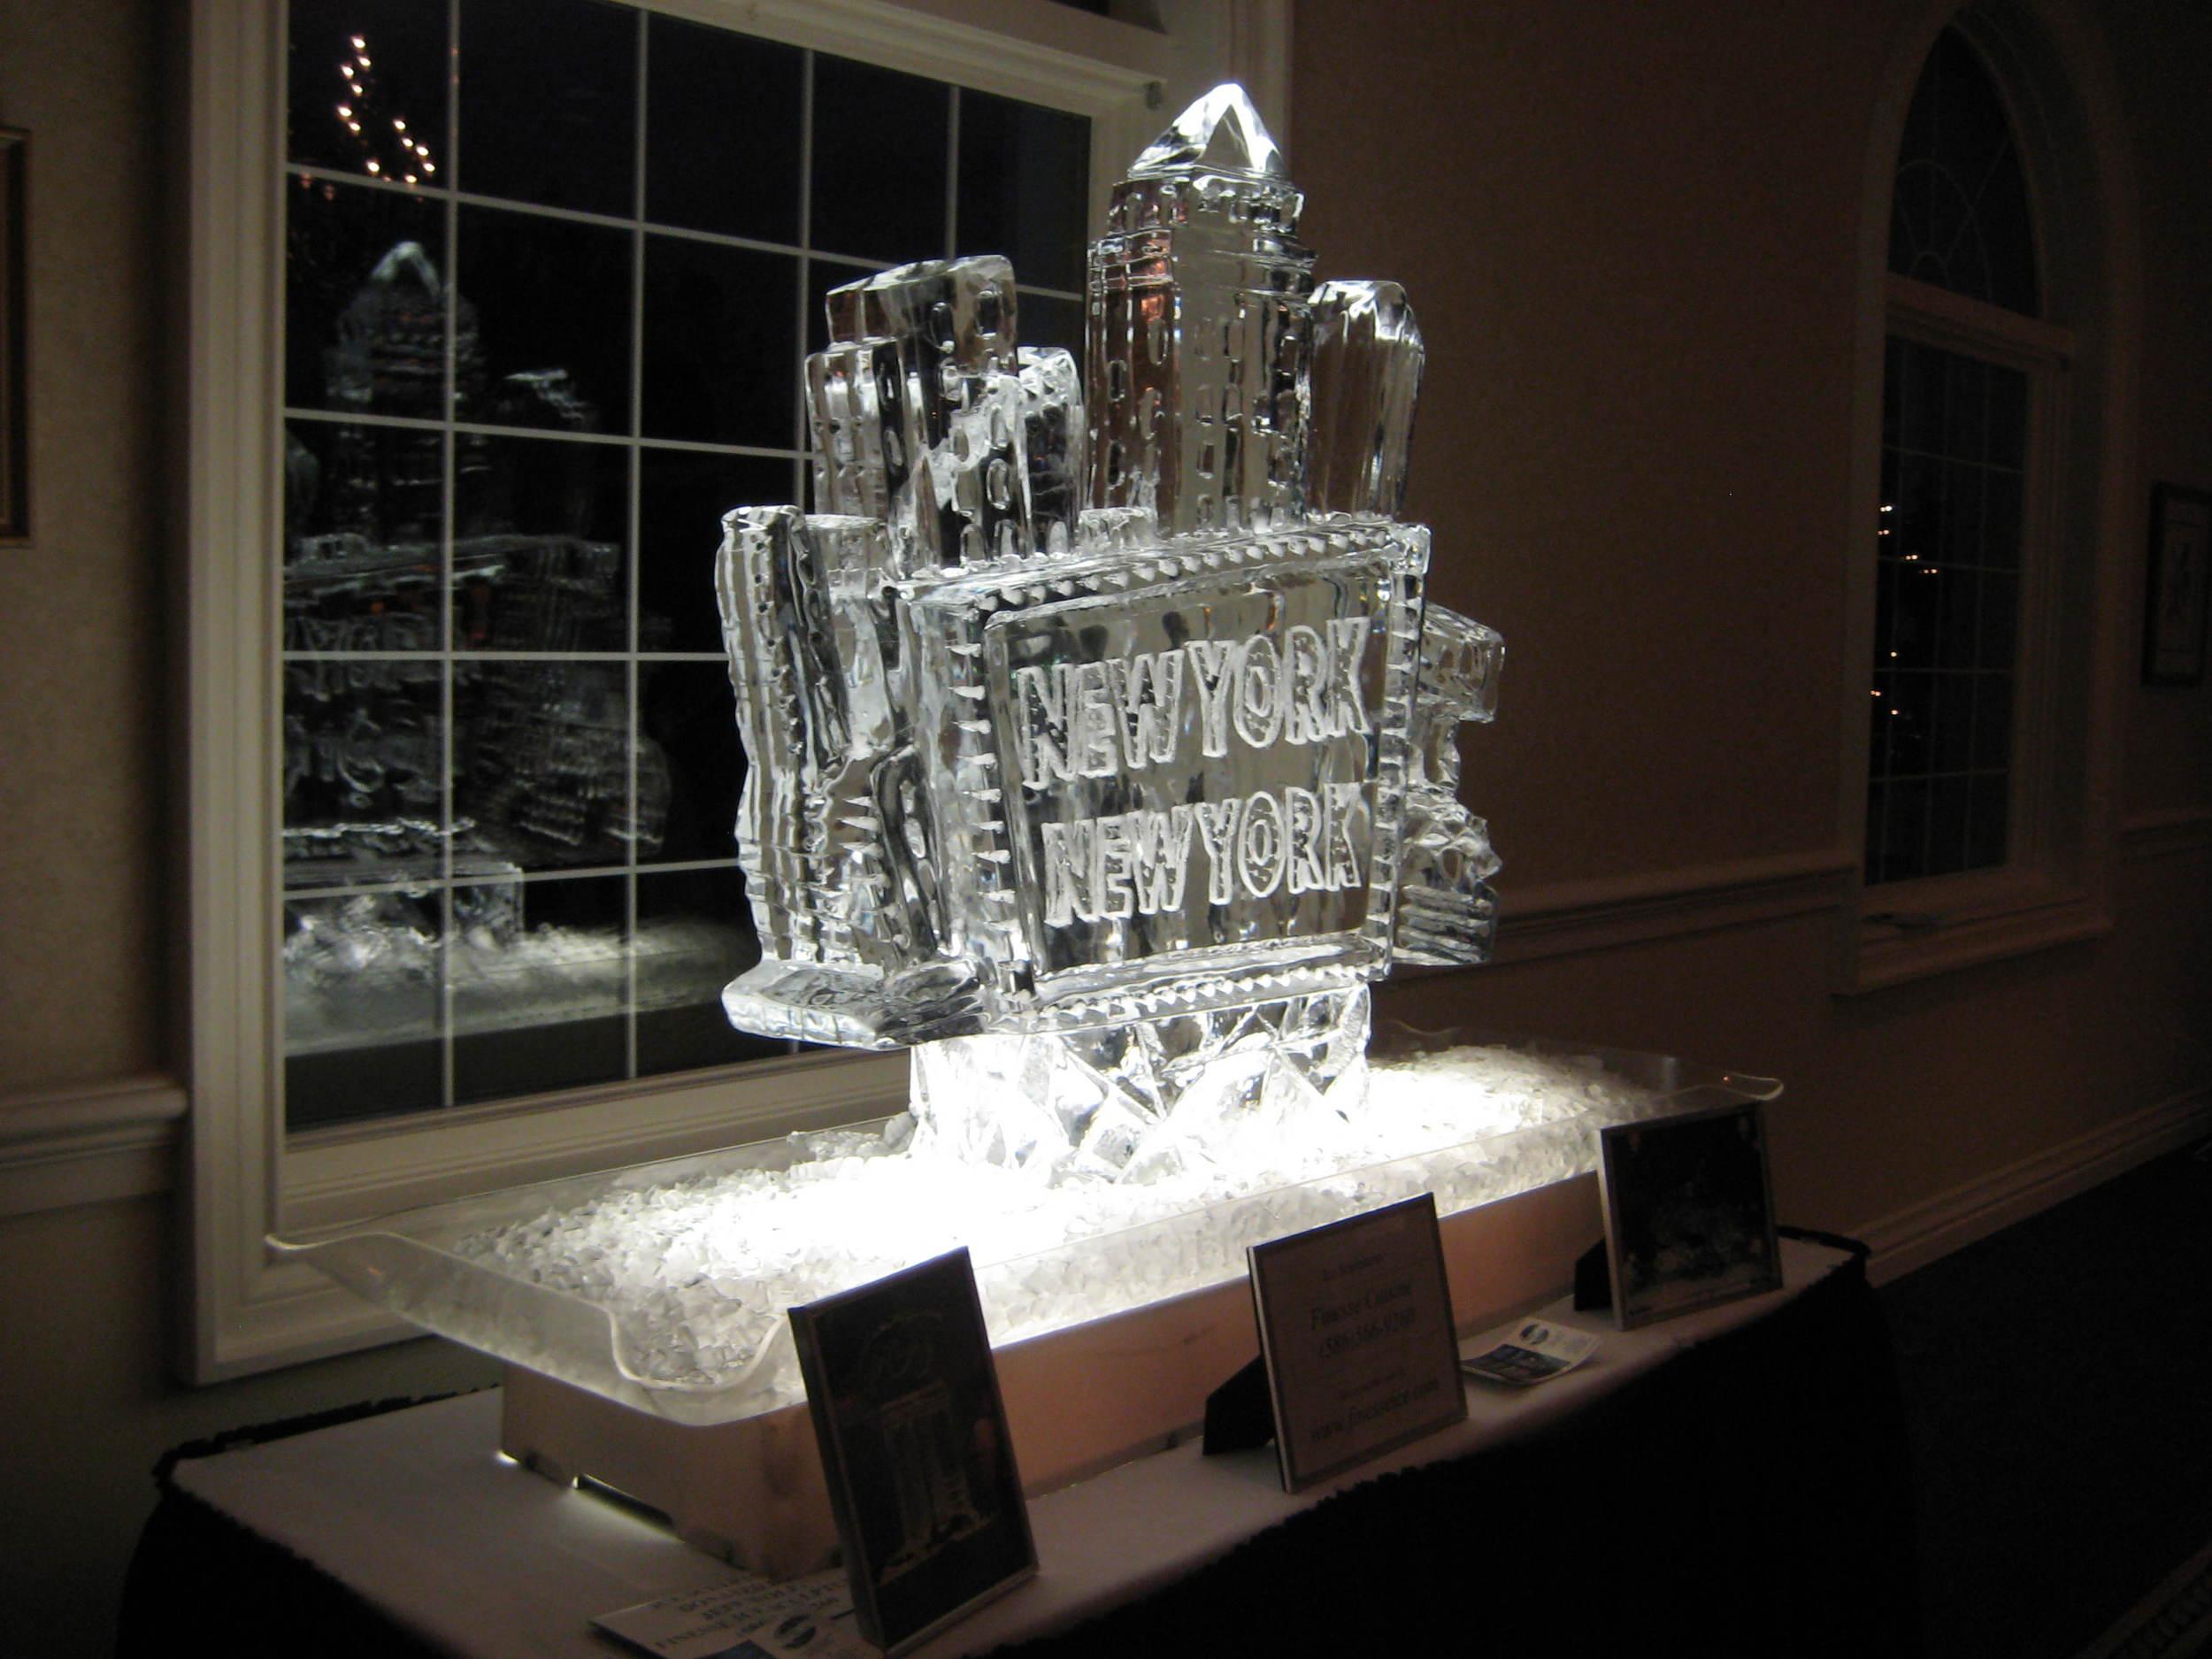 Ice_Sculpture_New York.JPG